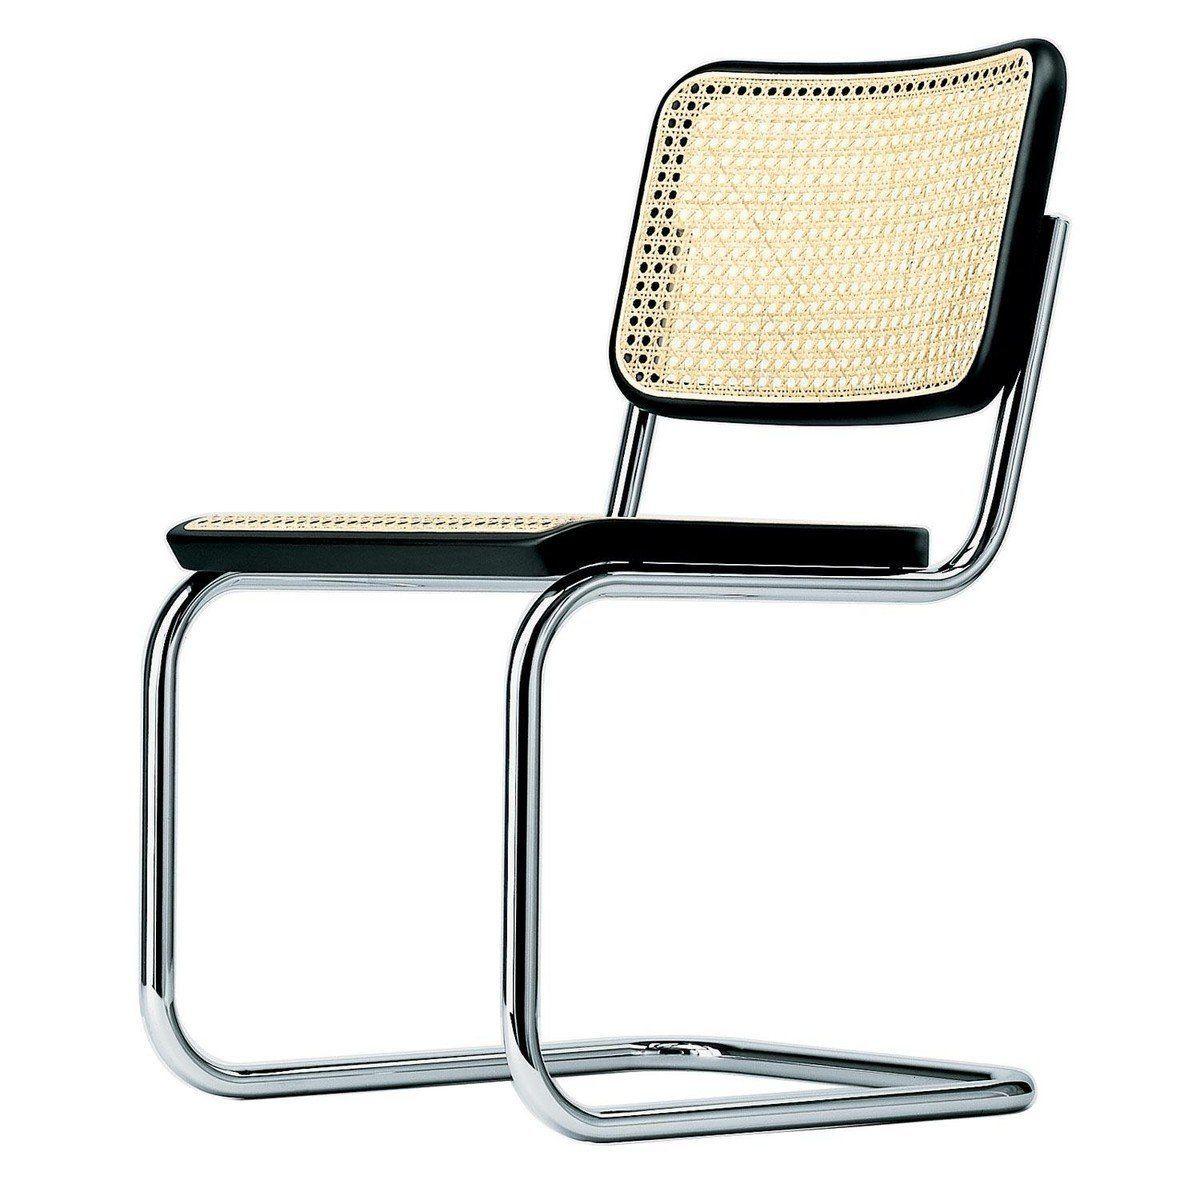 Thonet S 32 Cantilever Chair Thonet AmbienteDirectcom